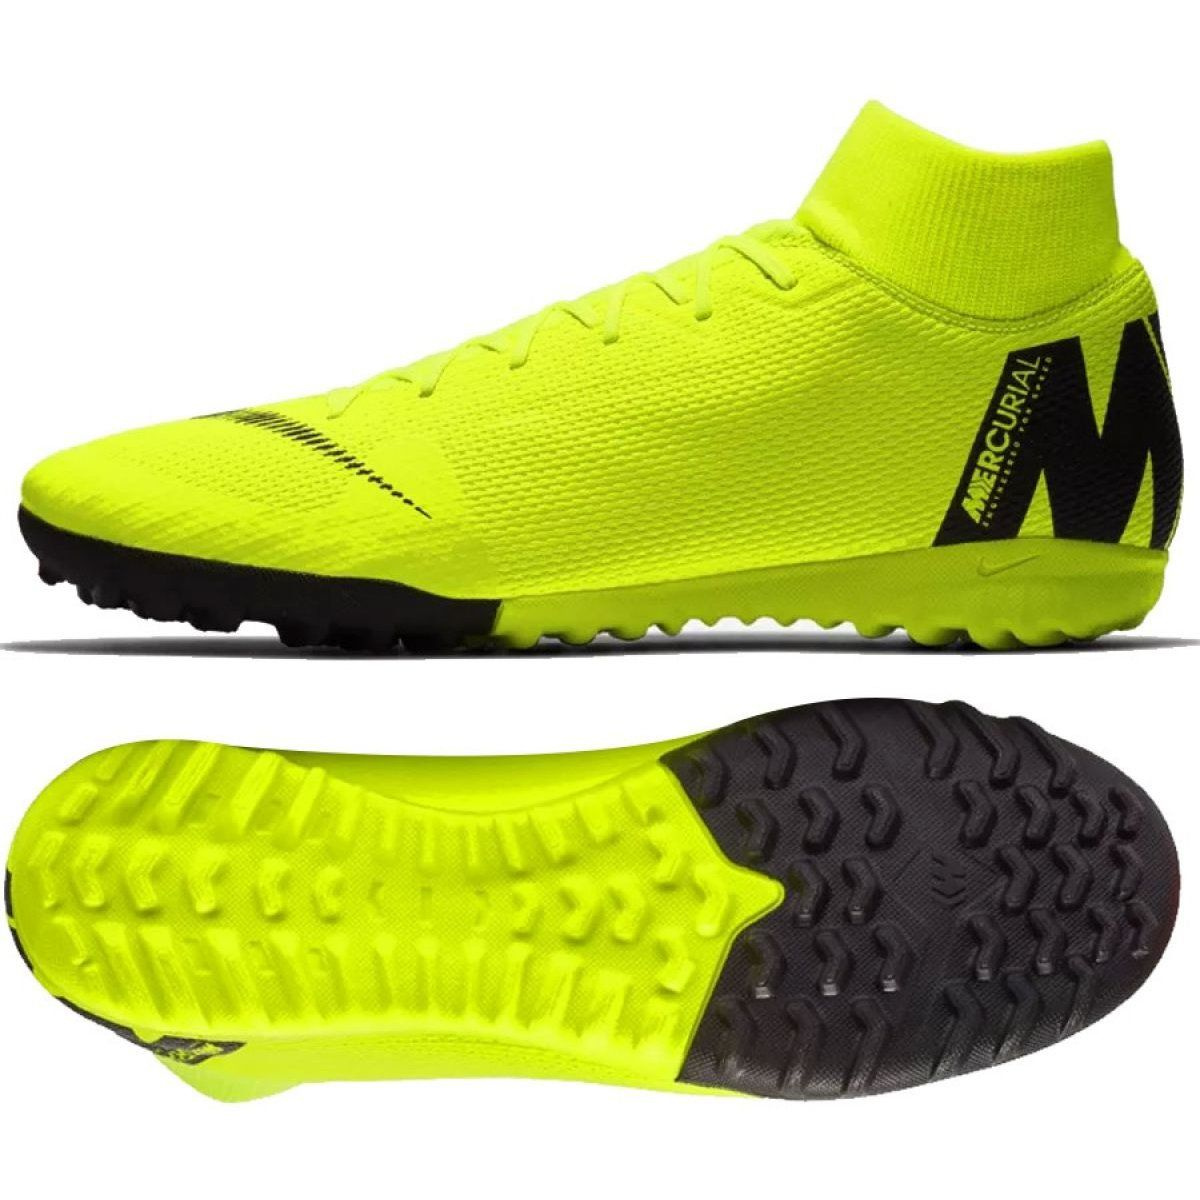 Buty Pilkarskie Nike Mercurial Superflyx 6 Academy Tf M Ah7370 701 Zolte Wielokolorowe Football Boots Nike Soccer Shoes Nike